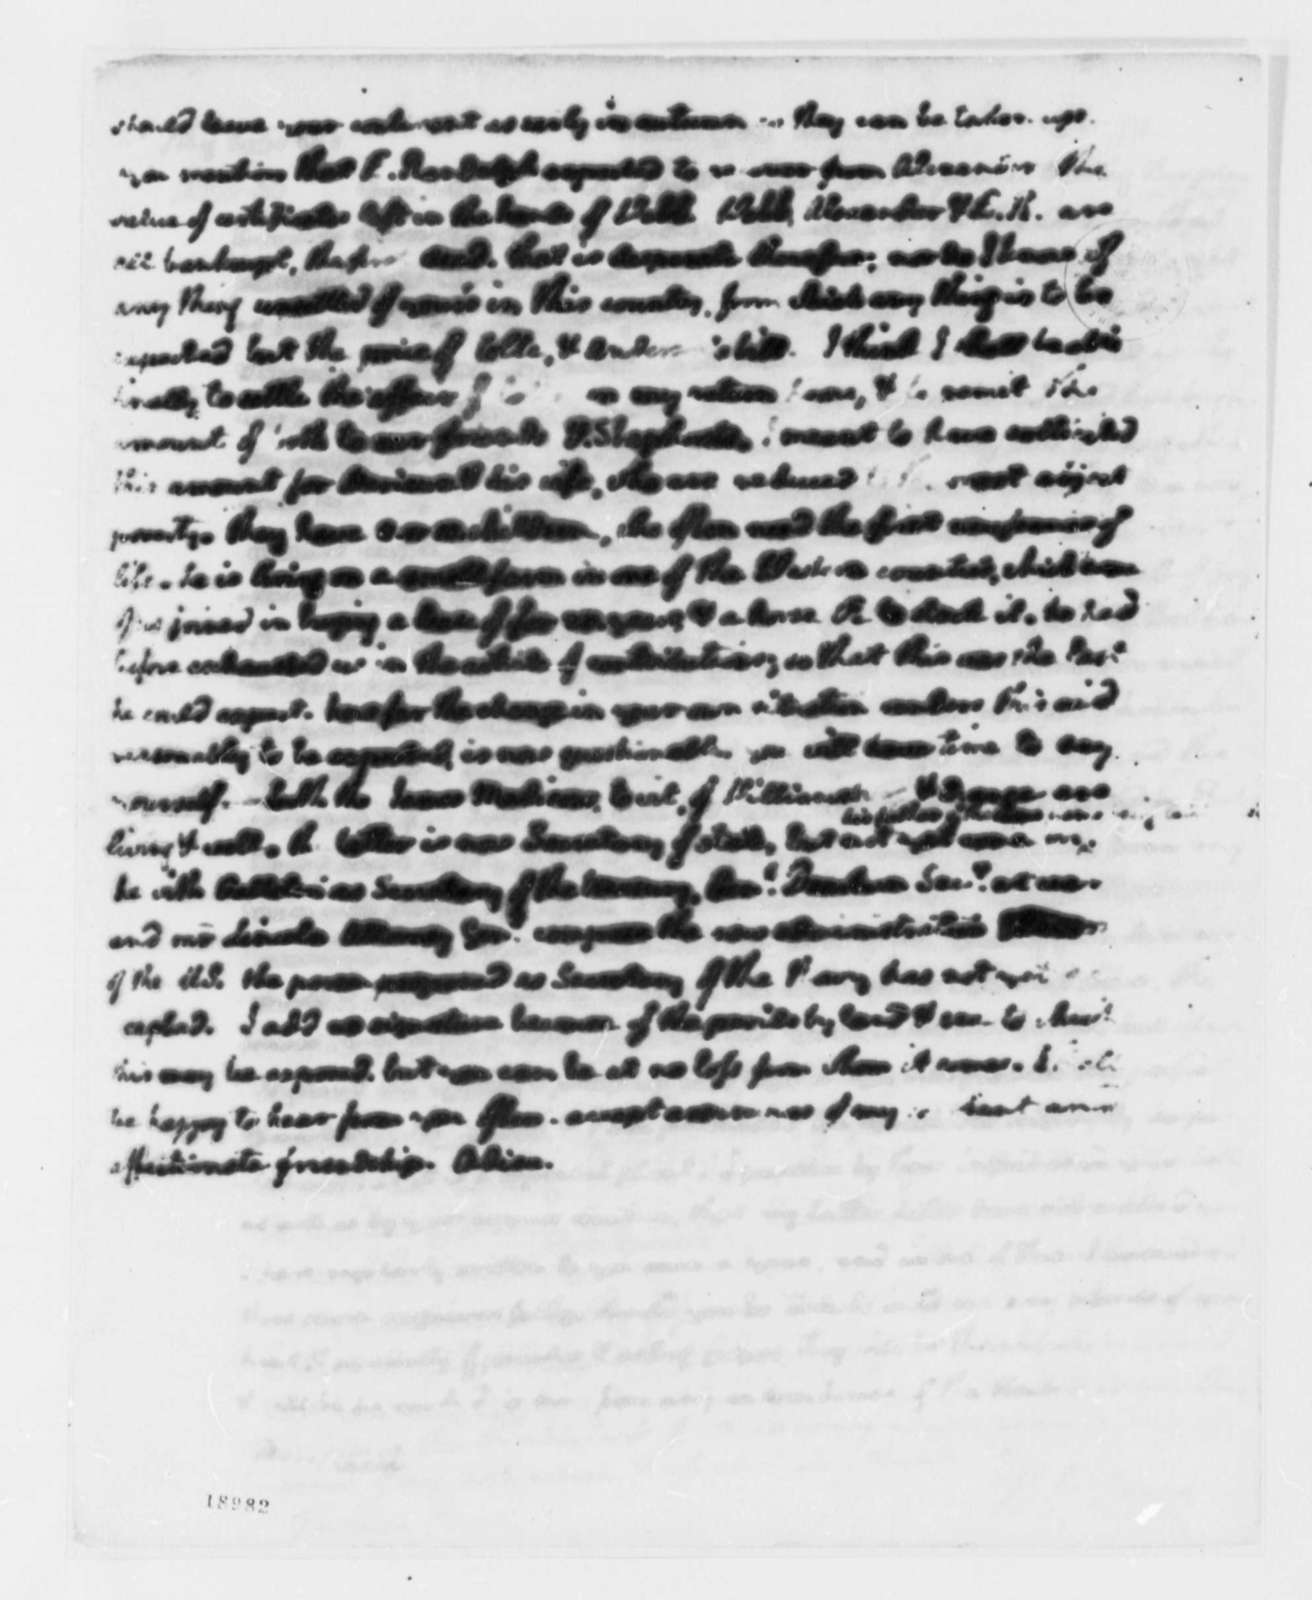 Thomas Jefferson to Philip Mazzei, March 17, 1801